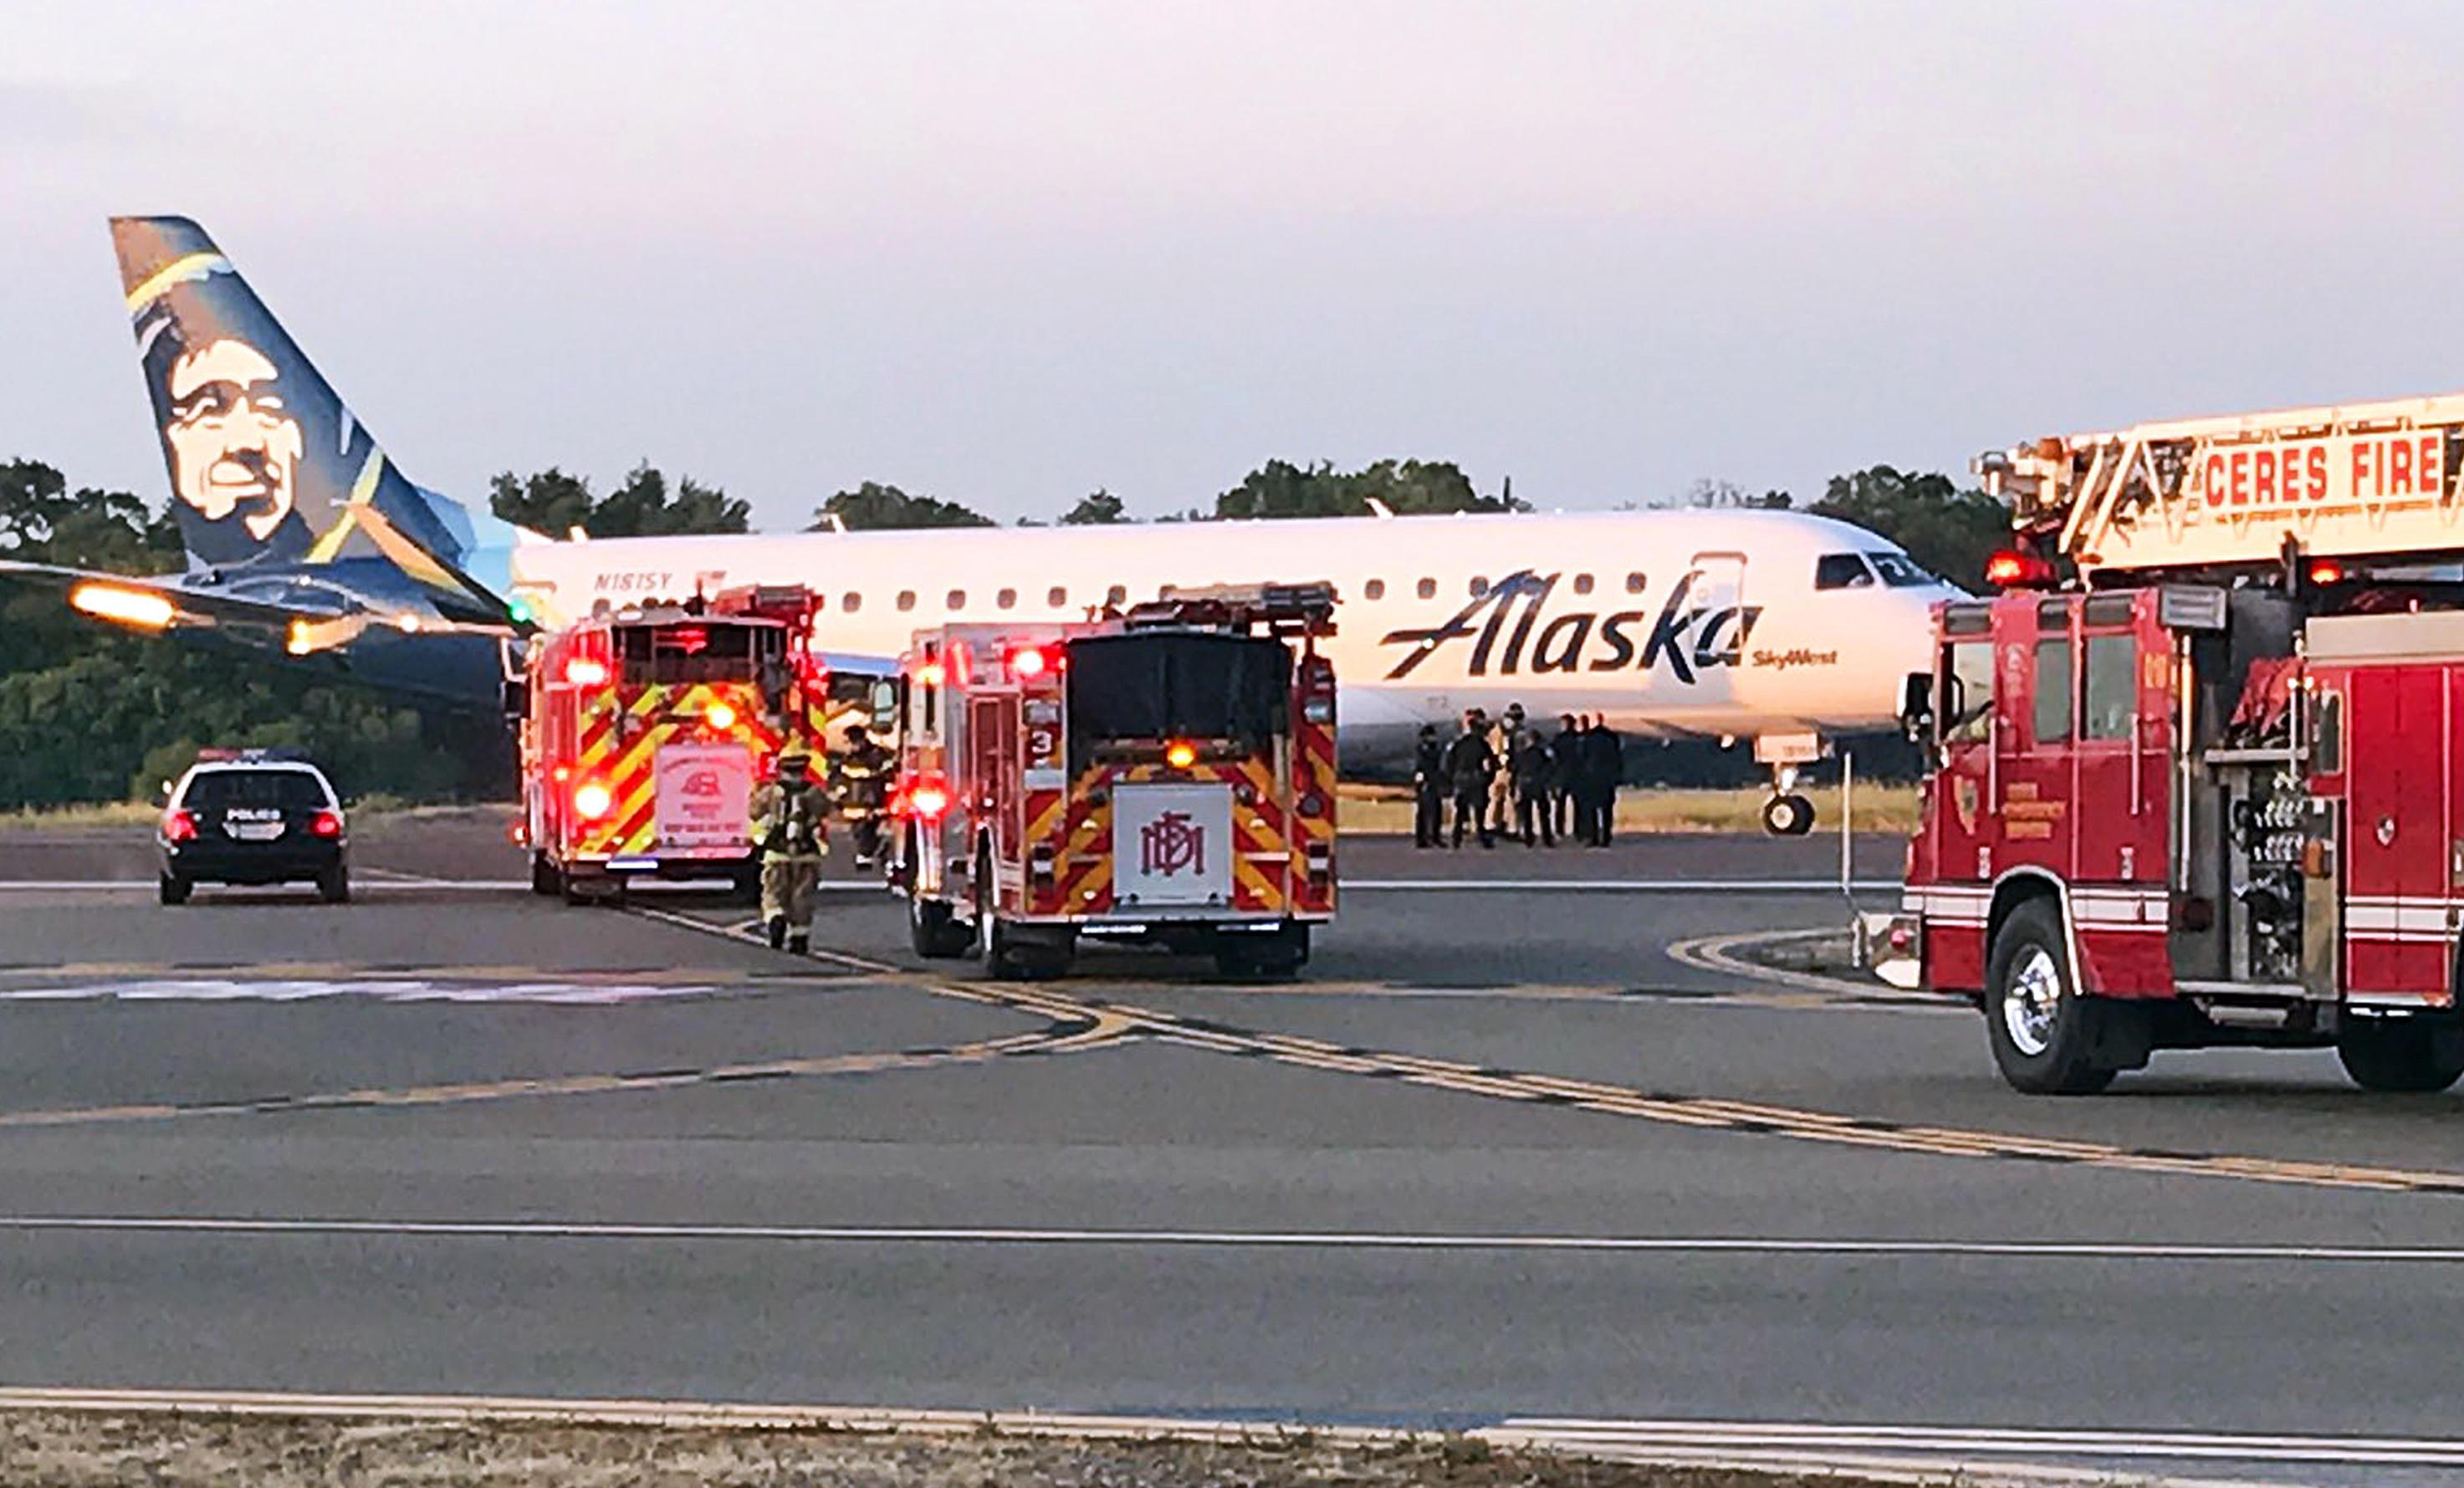 Alaska Airlines Flight 3391 Forced To Make Unplanned